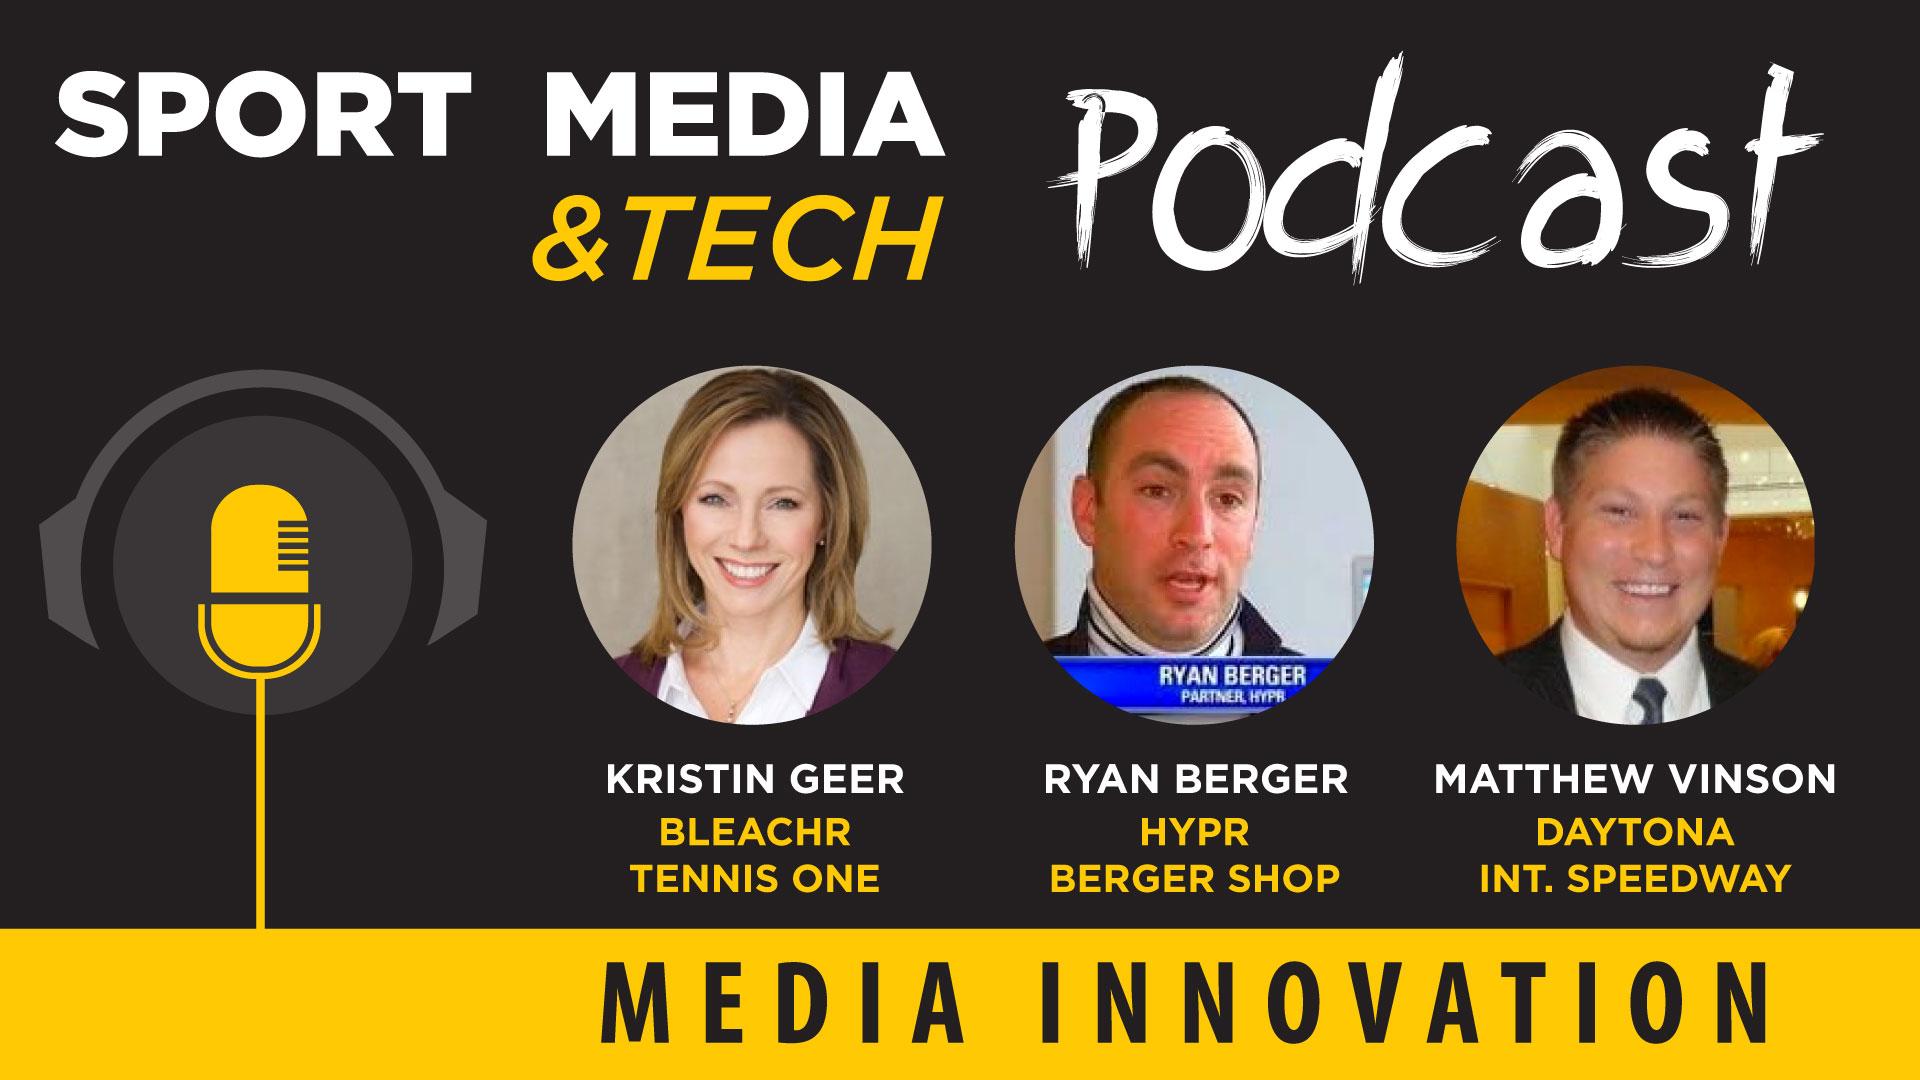 Episode 6: Media Innovation